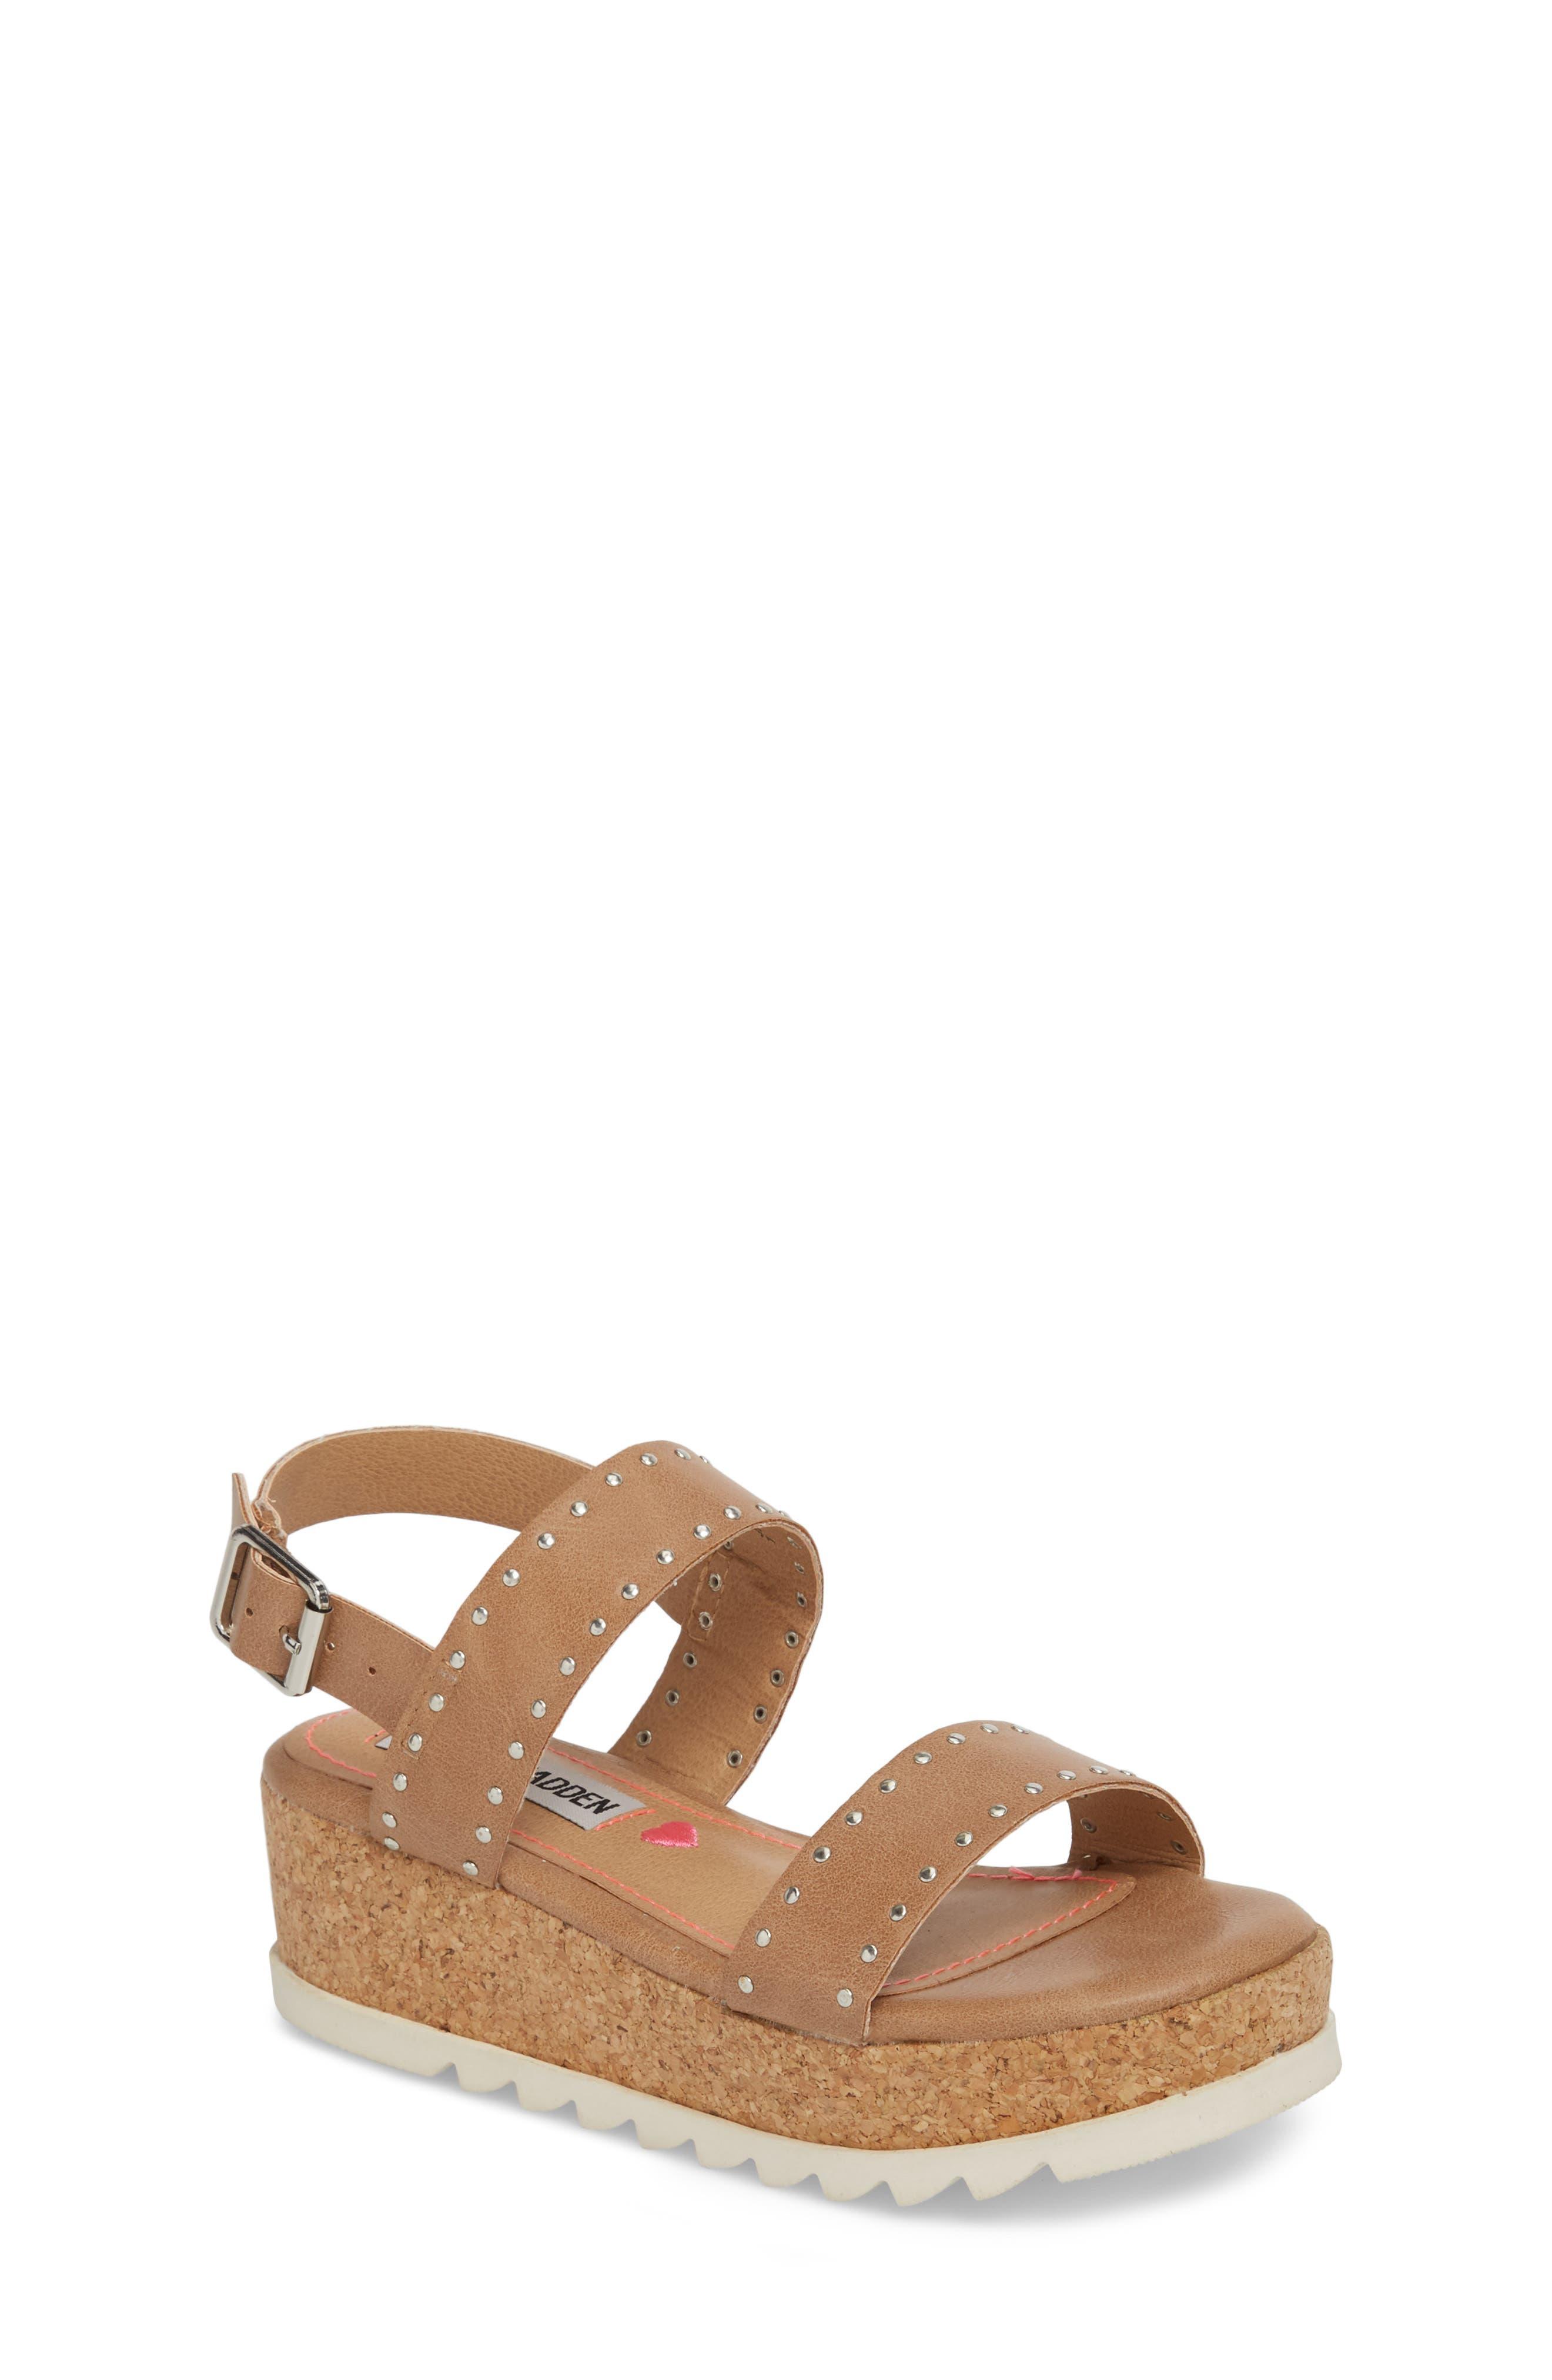 JKRISTIE Platform Sandal,                             Main thumbnail 1, color,                             Natural